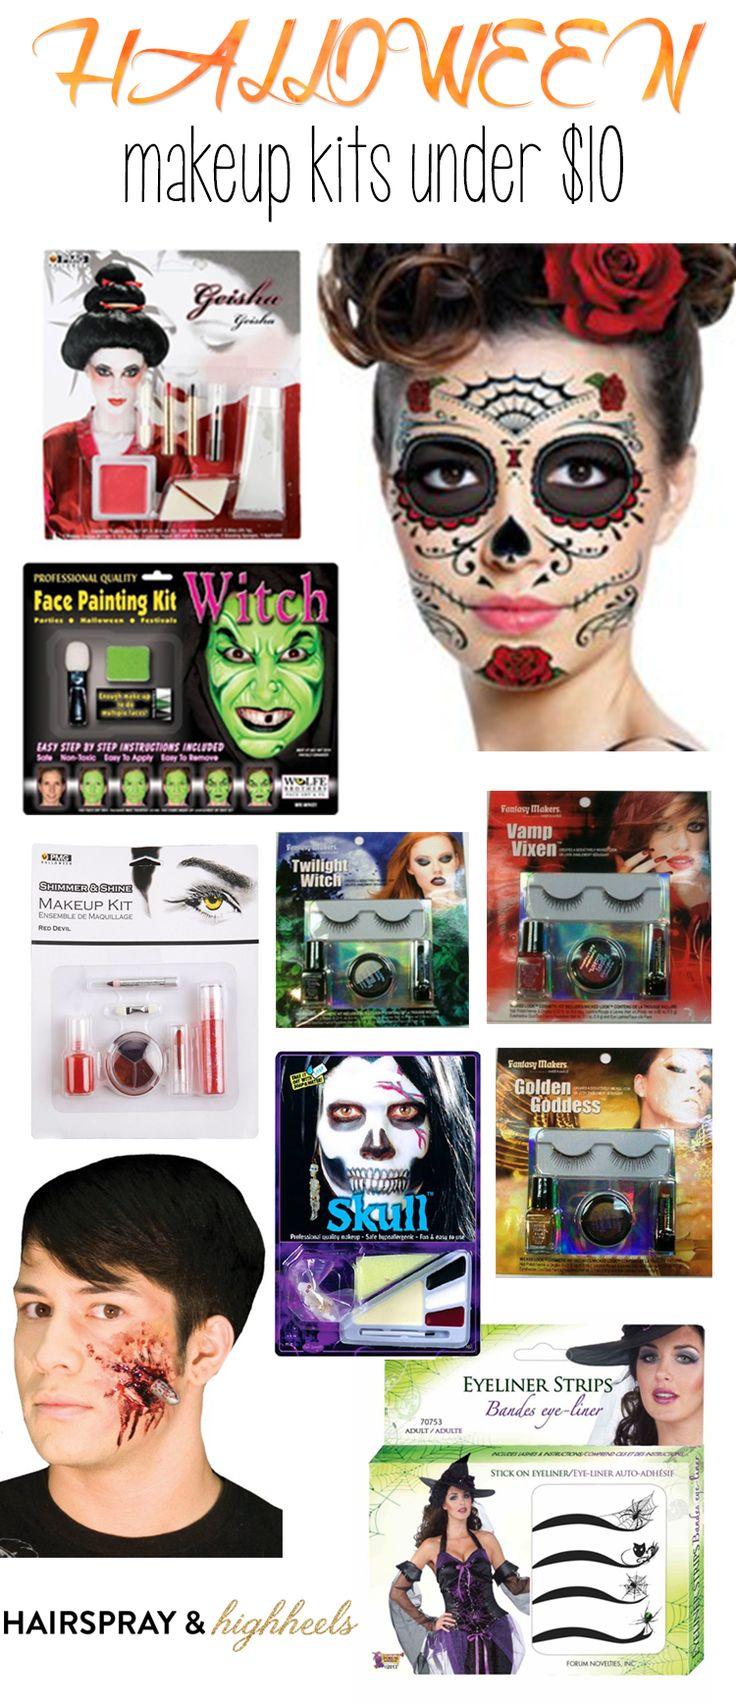 Halloween Makeup Kits Under $10 by Hairspray and Highheels #spooky #costumes #halloweencostumes